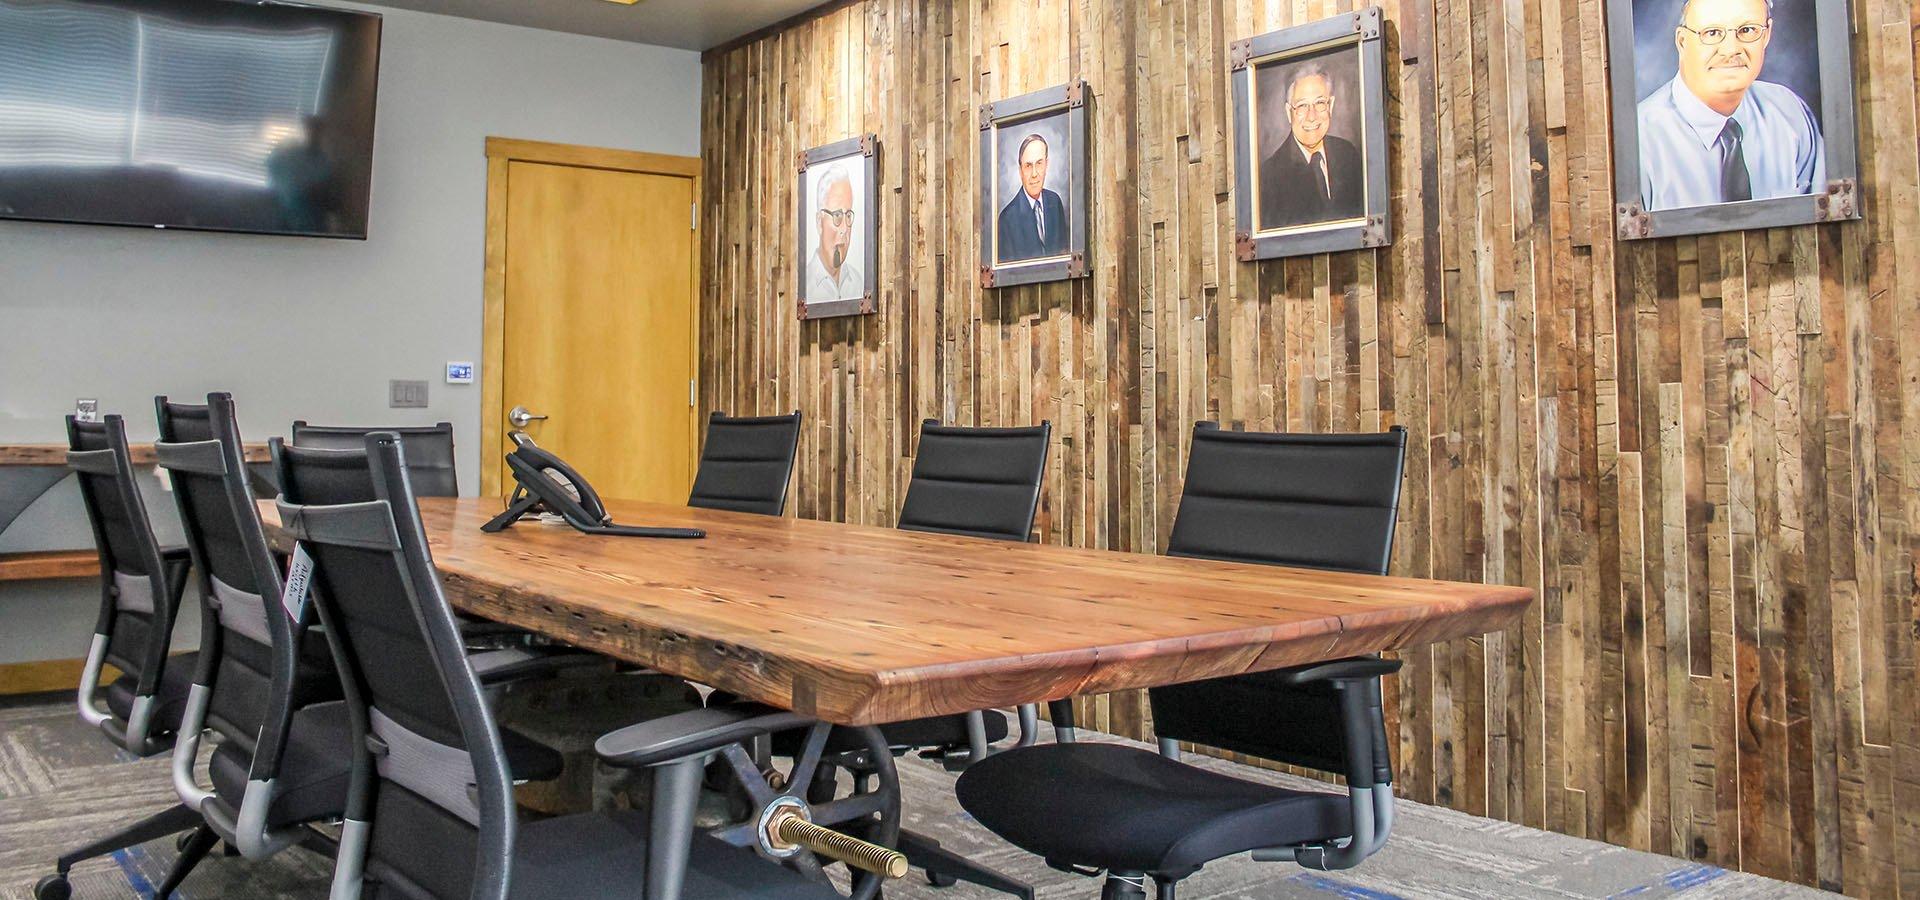 Schaus Mechanical Office Renovation | ACE Building Service